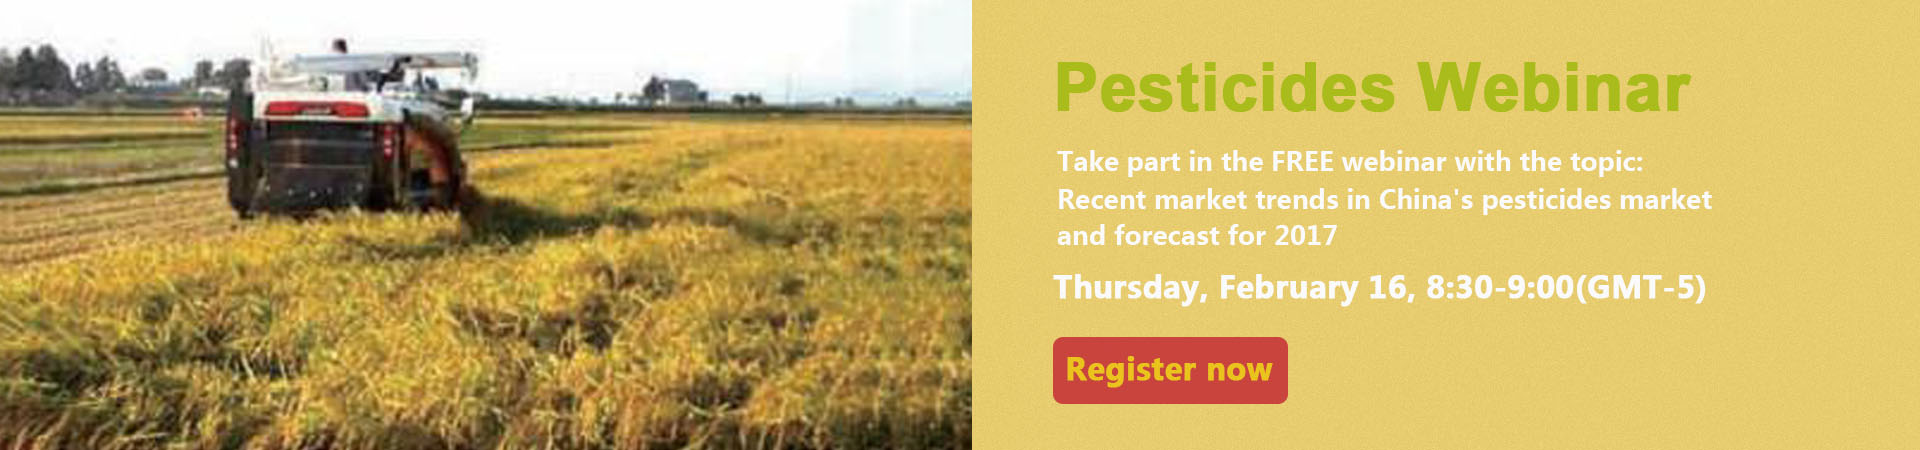 Pesticide Webinar- Market Information from china